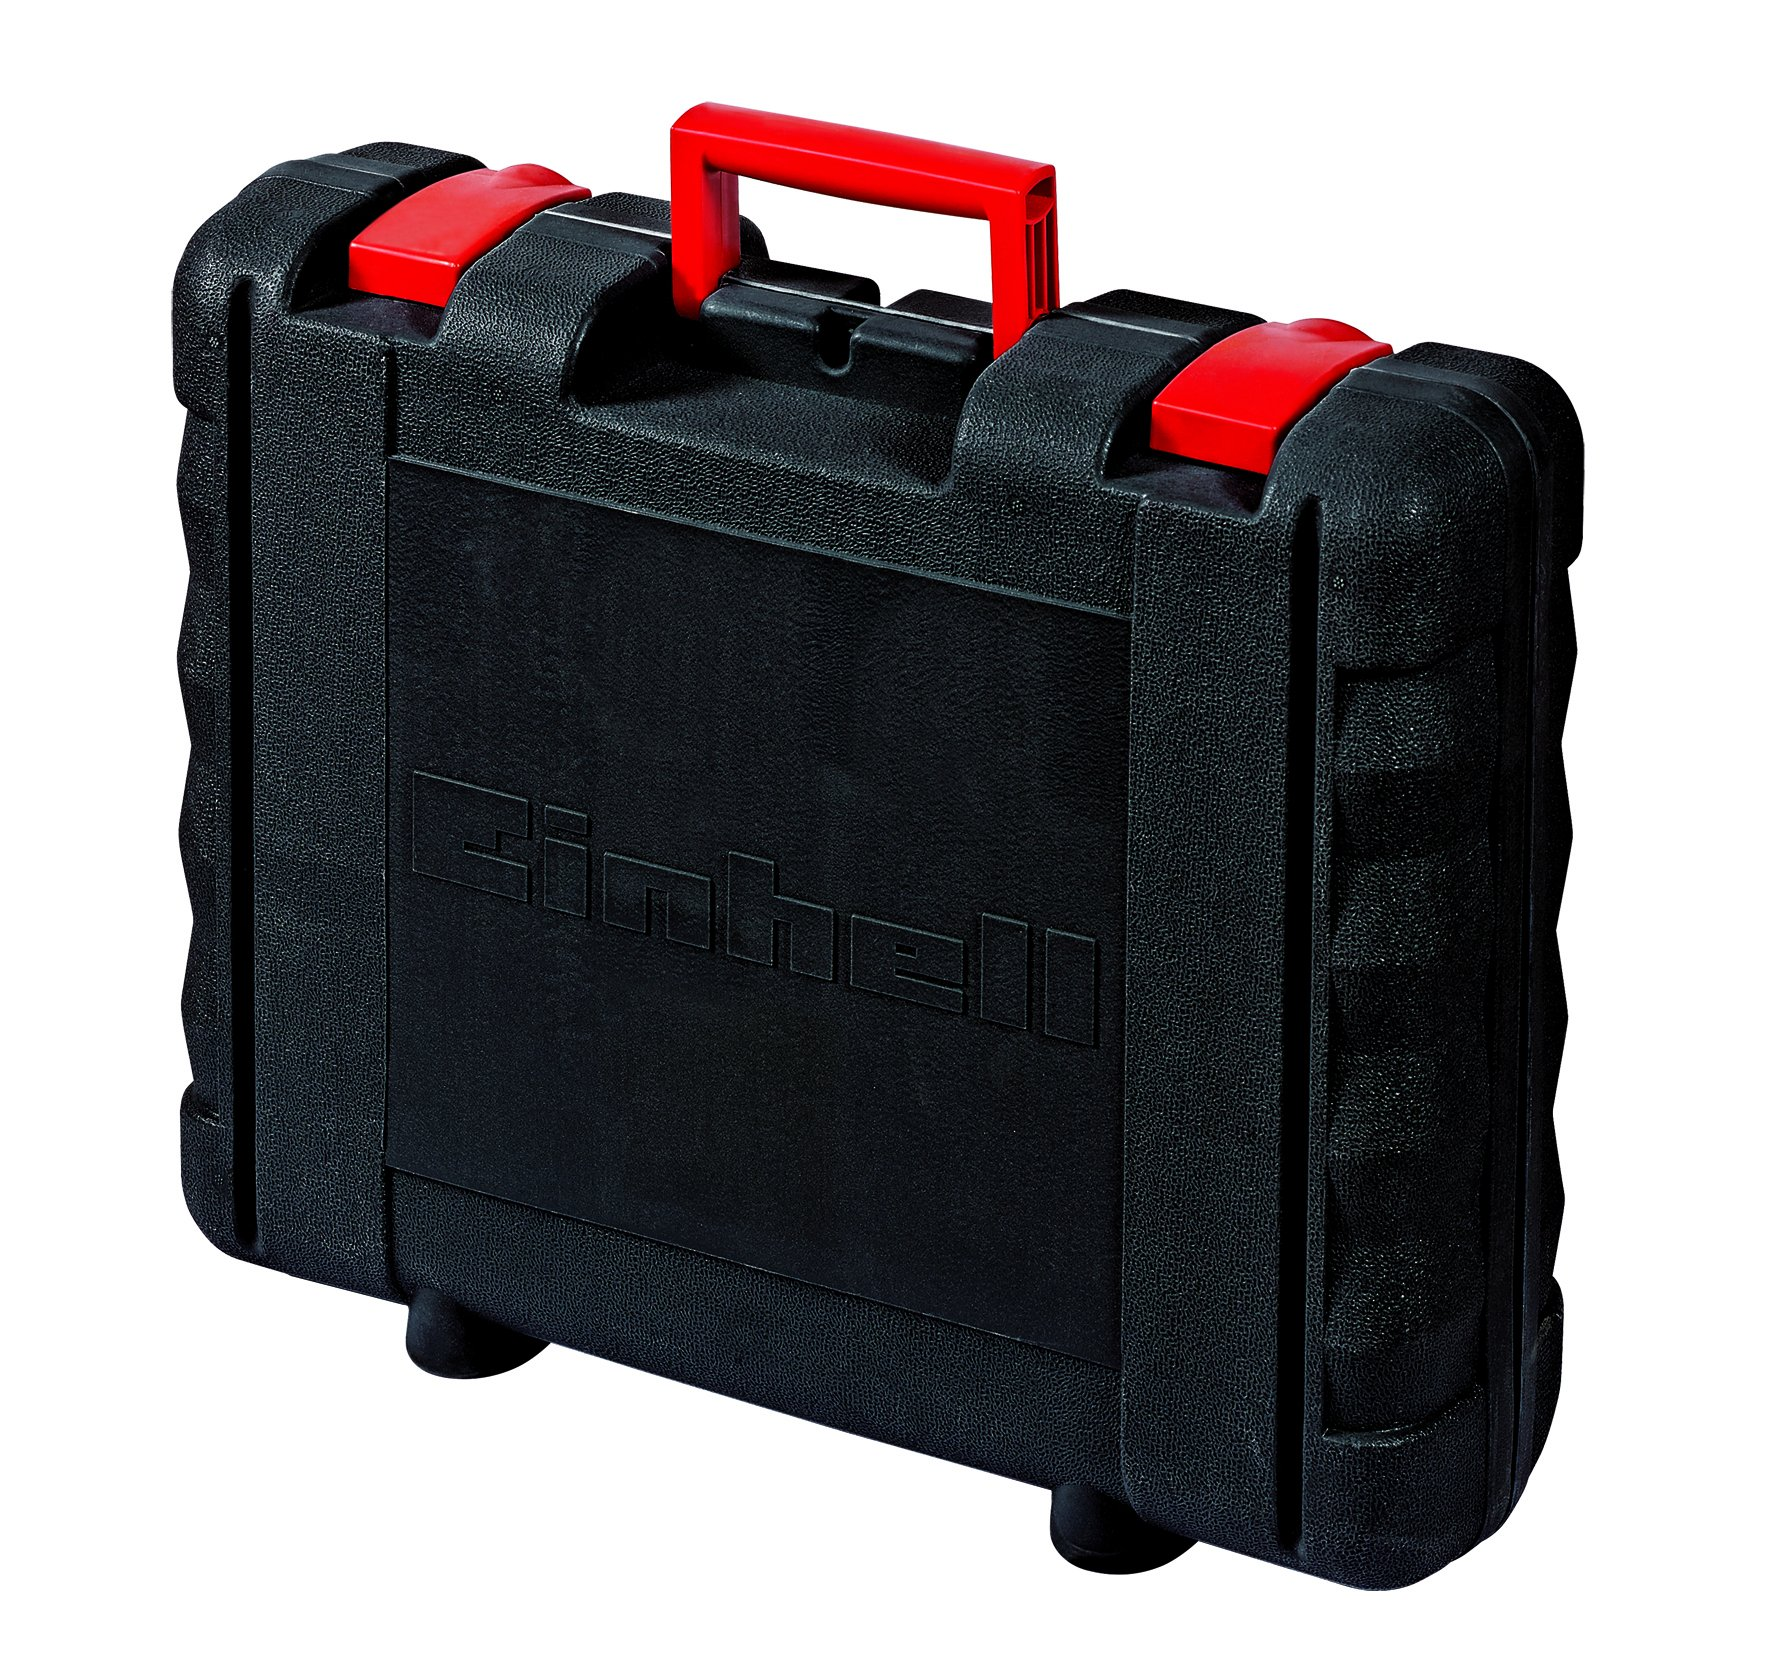 Einhell Akku Schlagbohrschrauber TE-CD 12 Li-i (Lithium Ionen, 12 V, 2 Gang, 30 Nm, LED Licht, Koffer, inkl. 2 x 2,0 Ah…